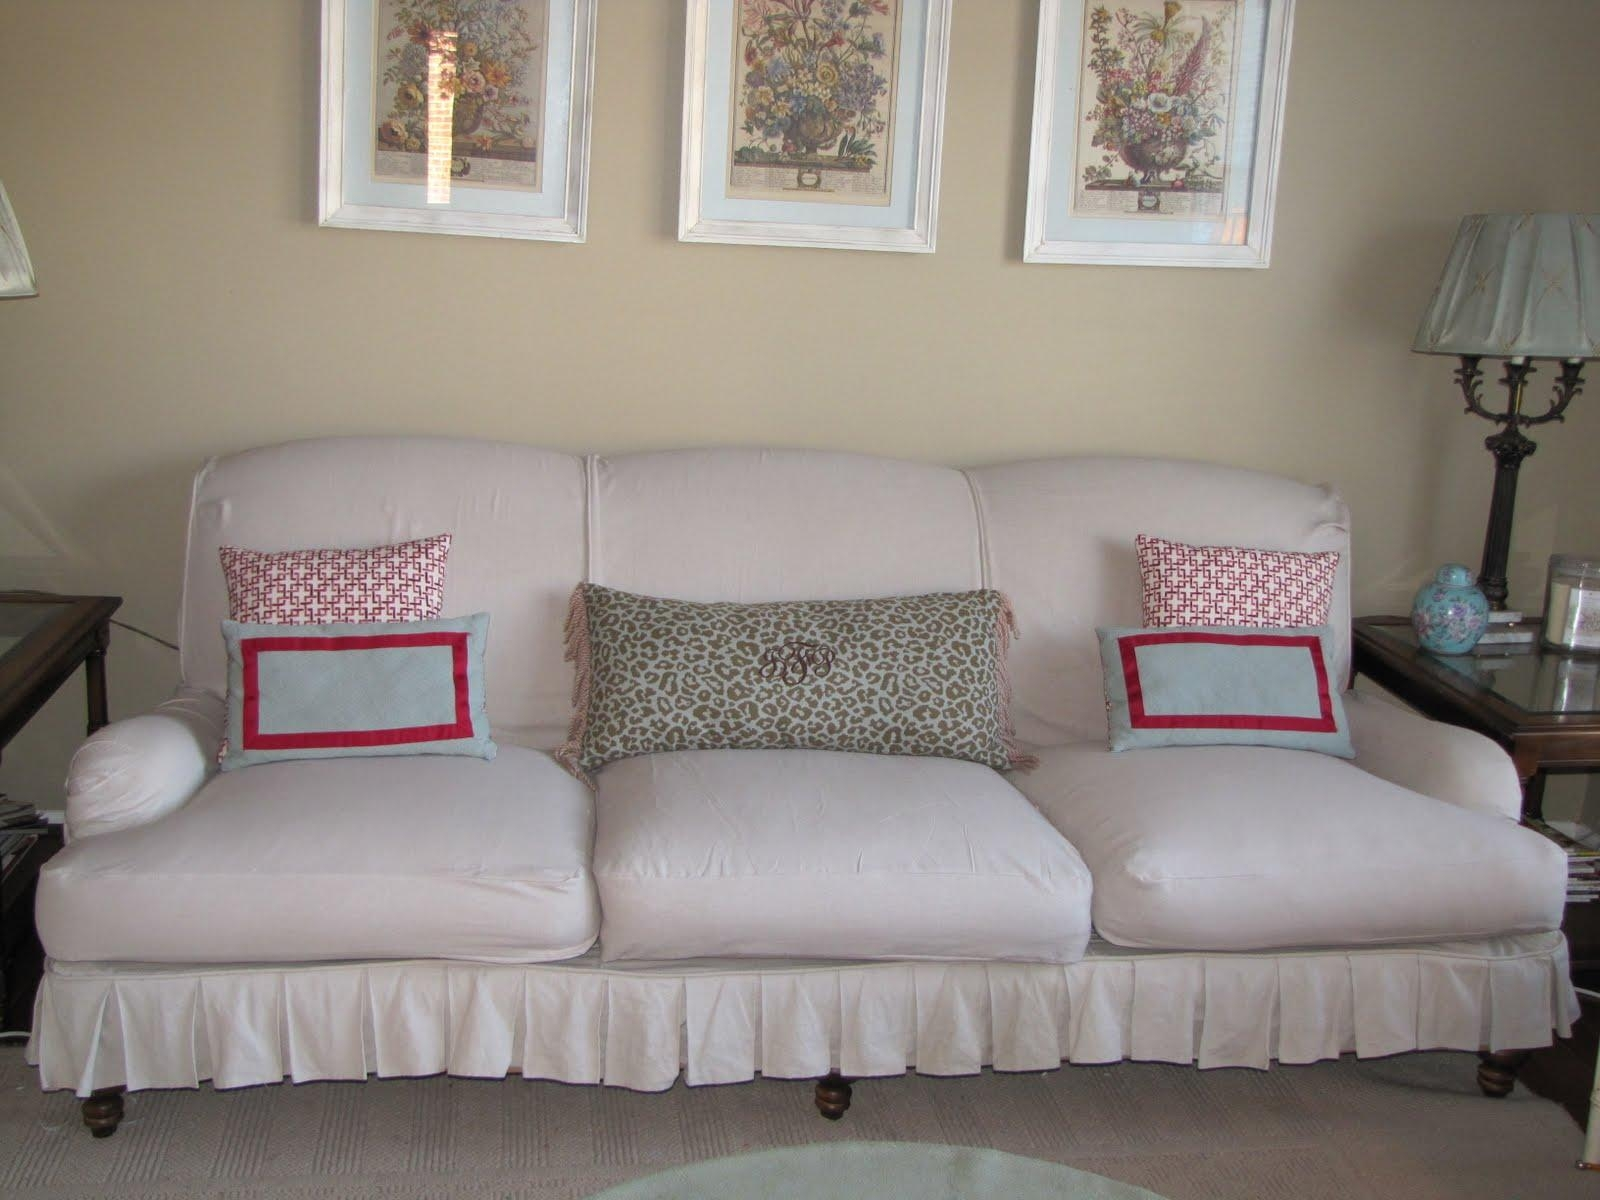 Sofas Center : Shabby Chic Slipcovers For Sofas Chenille Pertaining To Shabby Chic Slipcovers (Image 18 of 20)